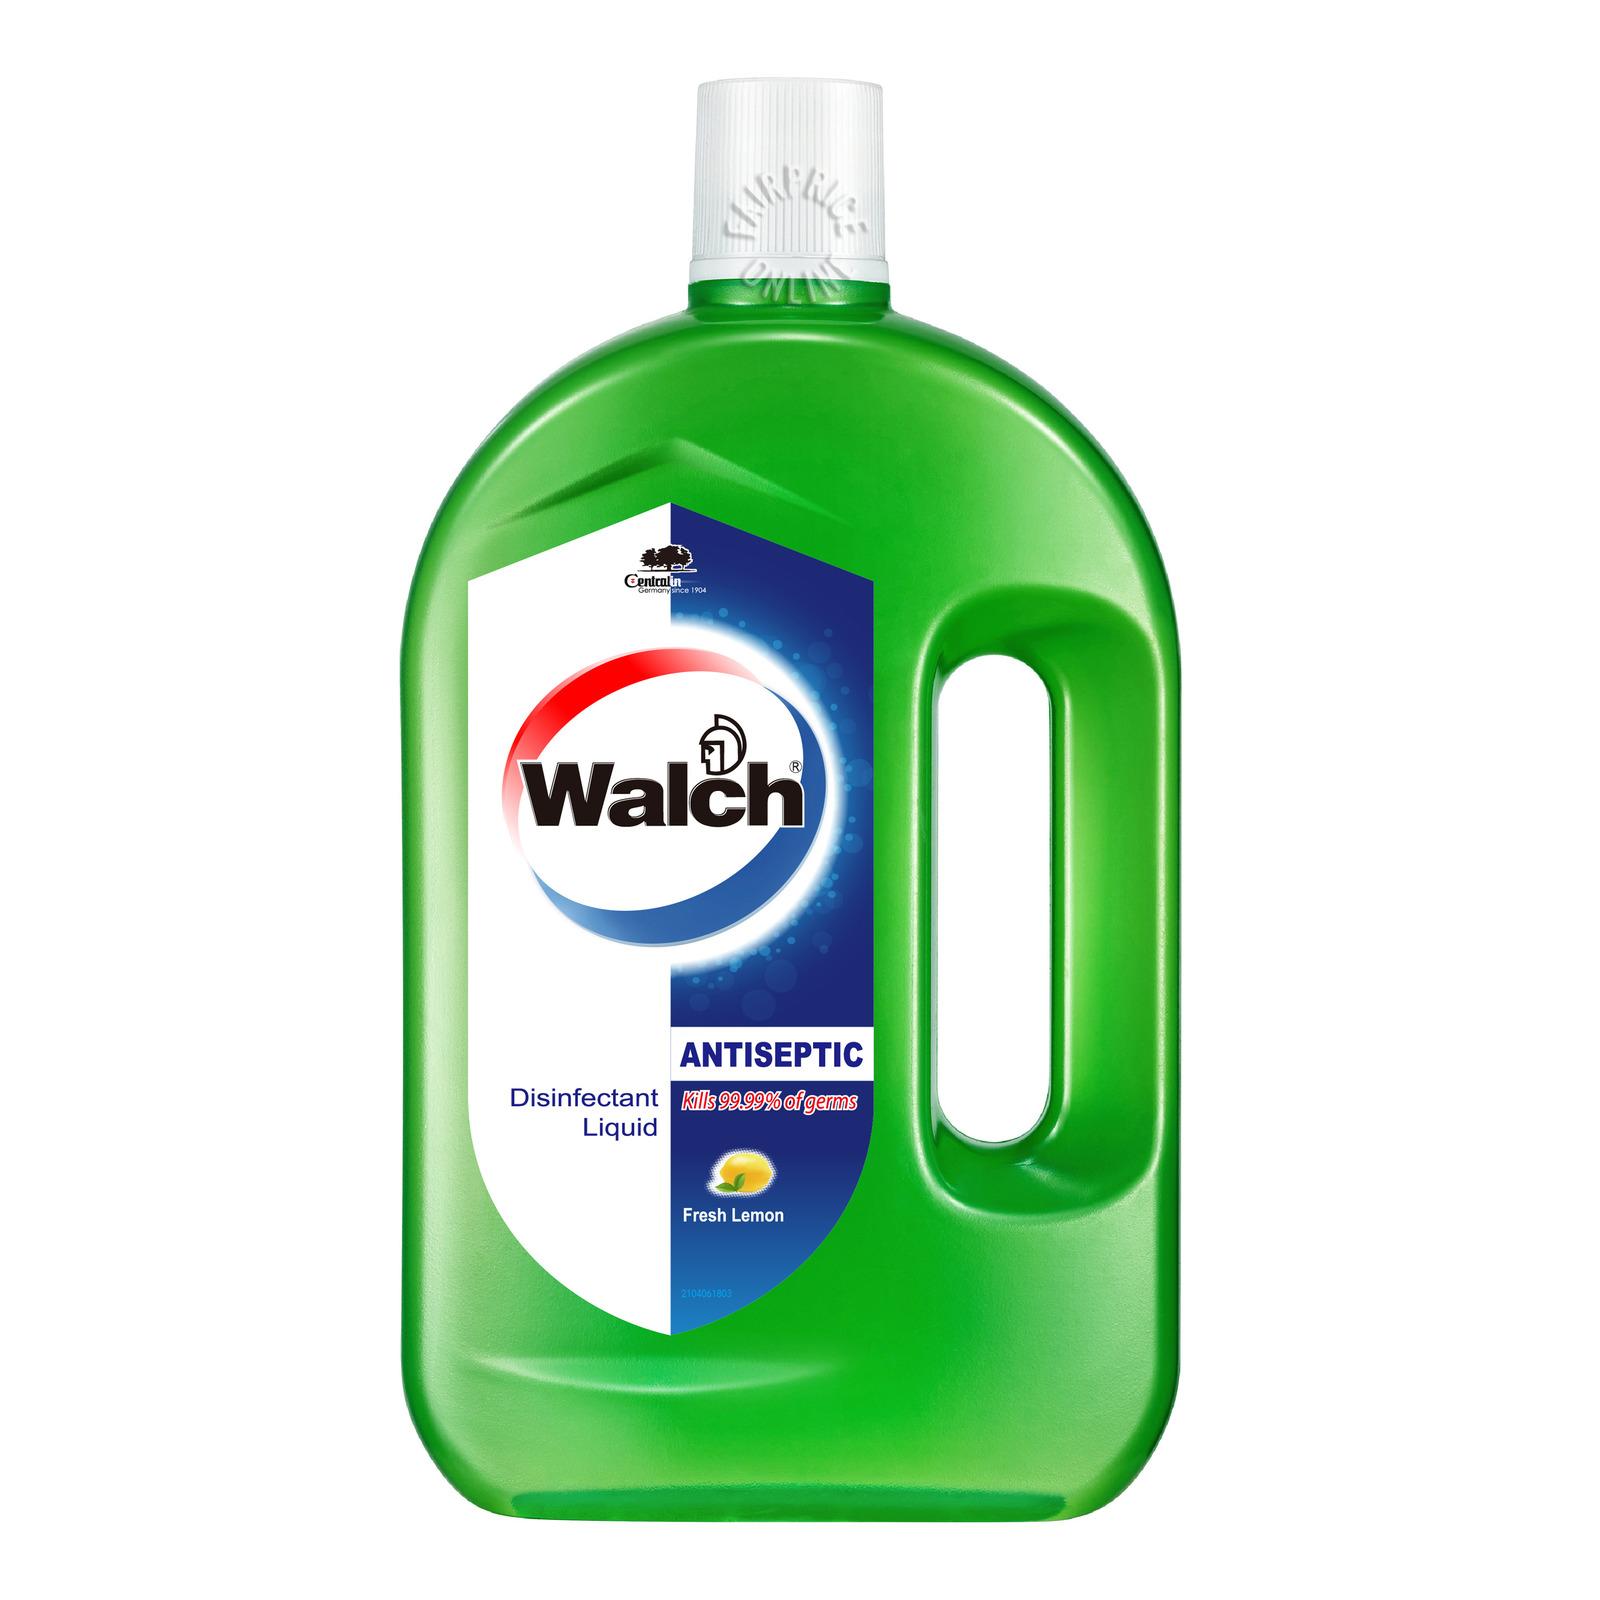 Walch Antiseptic Disinfectant Liquid - Fresh Lemon